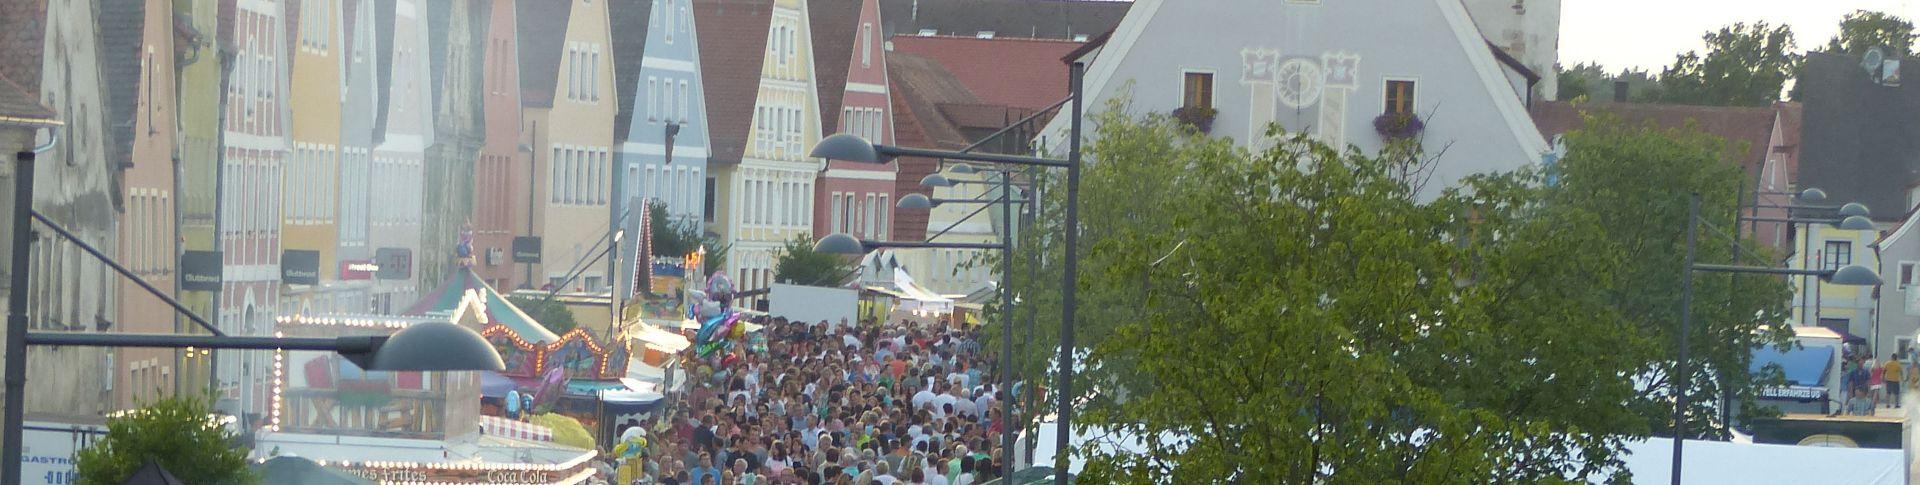 Stadttorfest